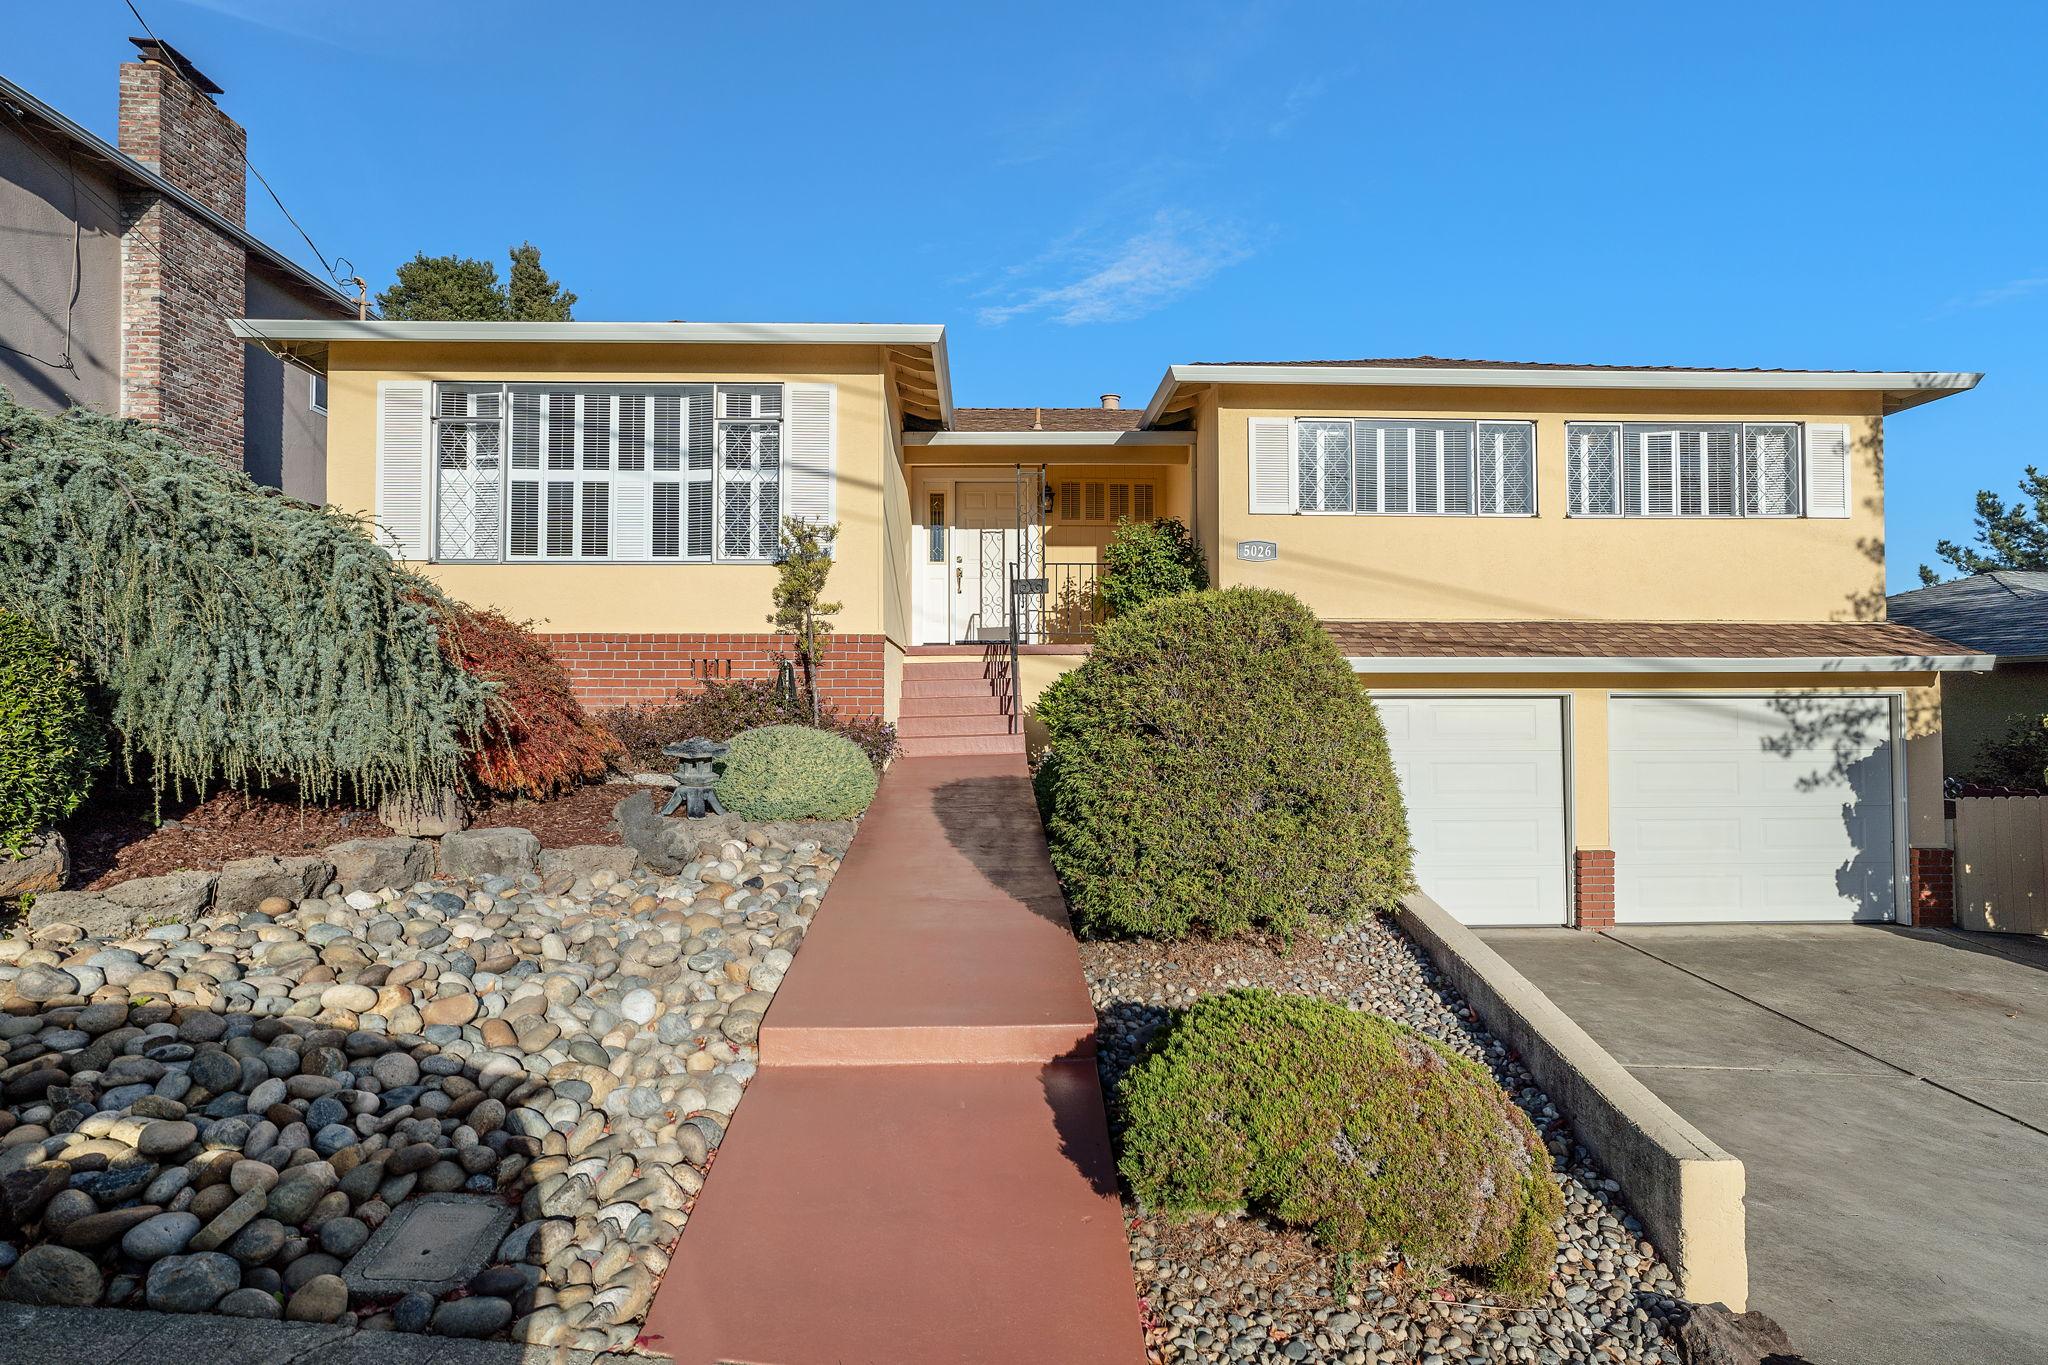 5026 Tyler Ln, Castro Valley, CA 94546, US